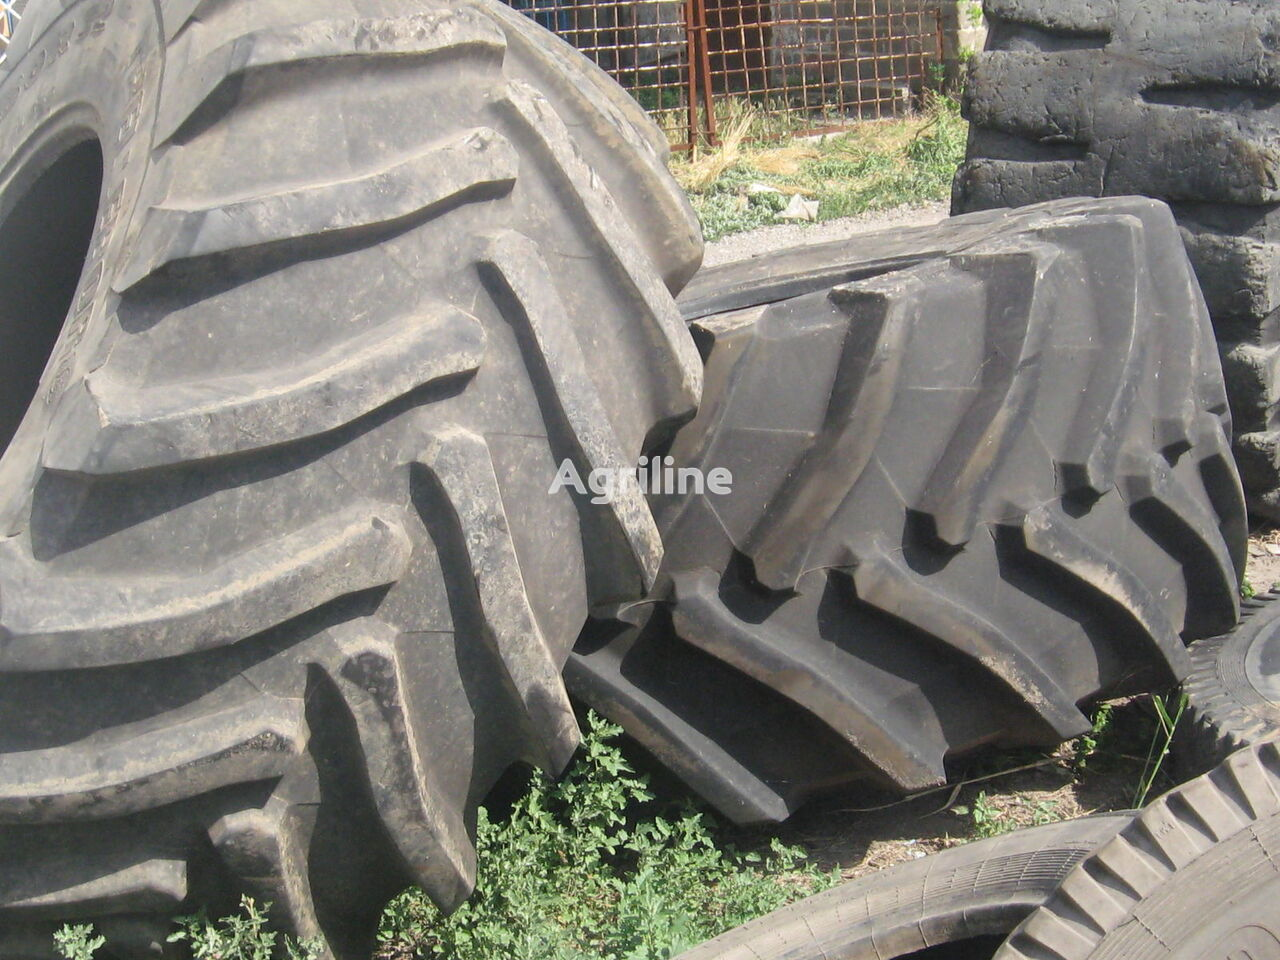 Alliance 900/60 R 32.00 neumático para tractor